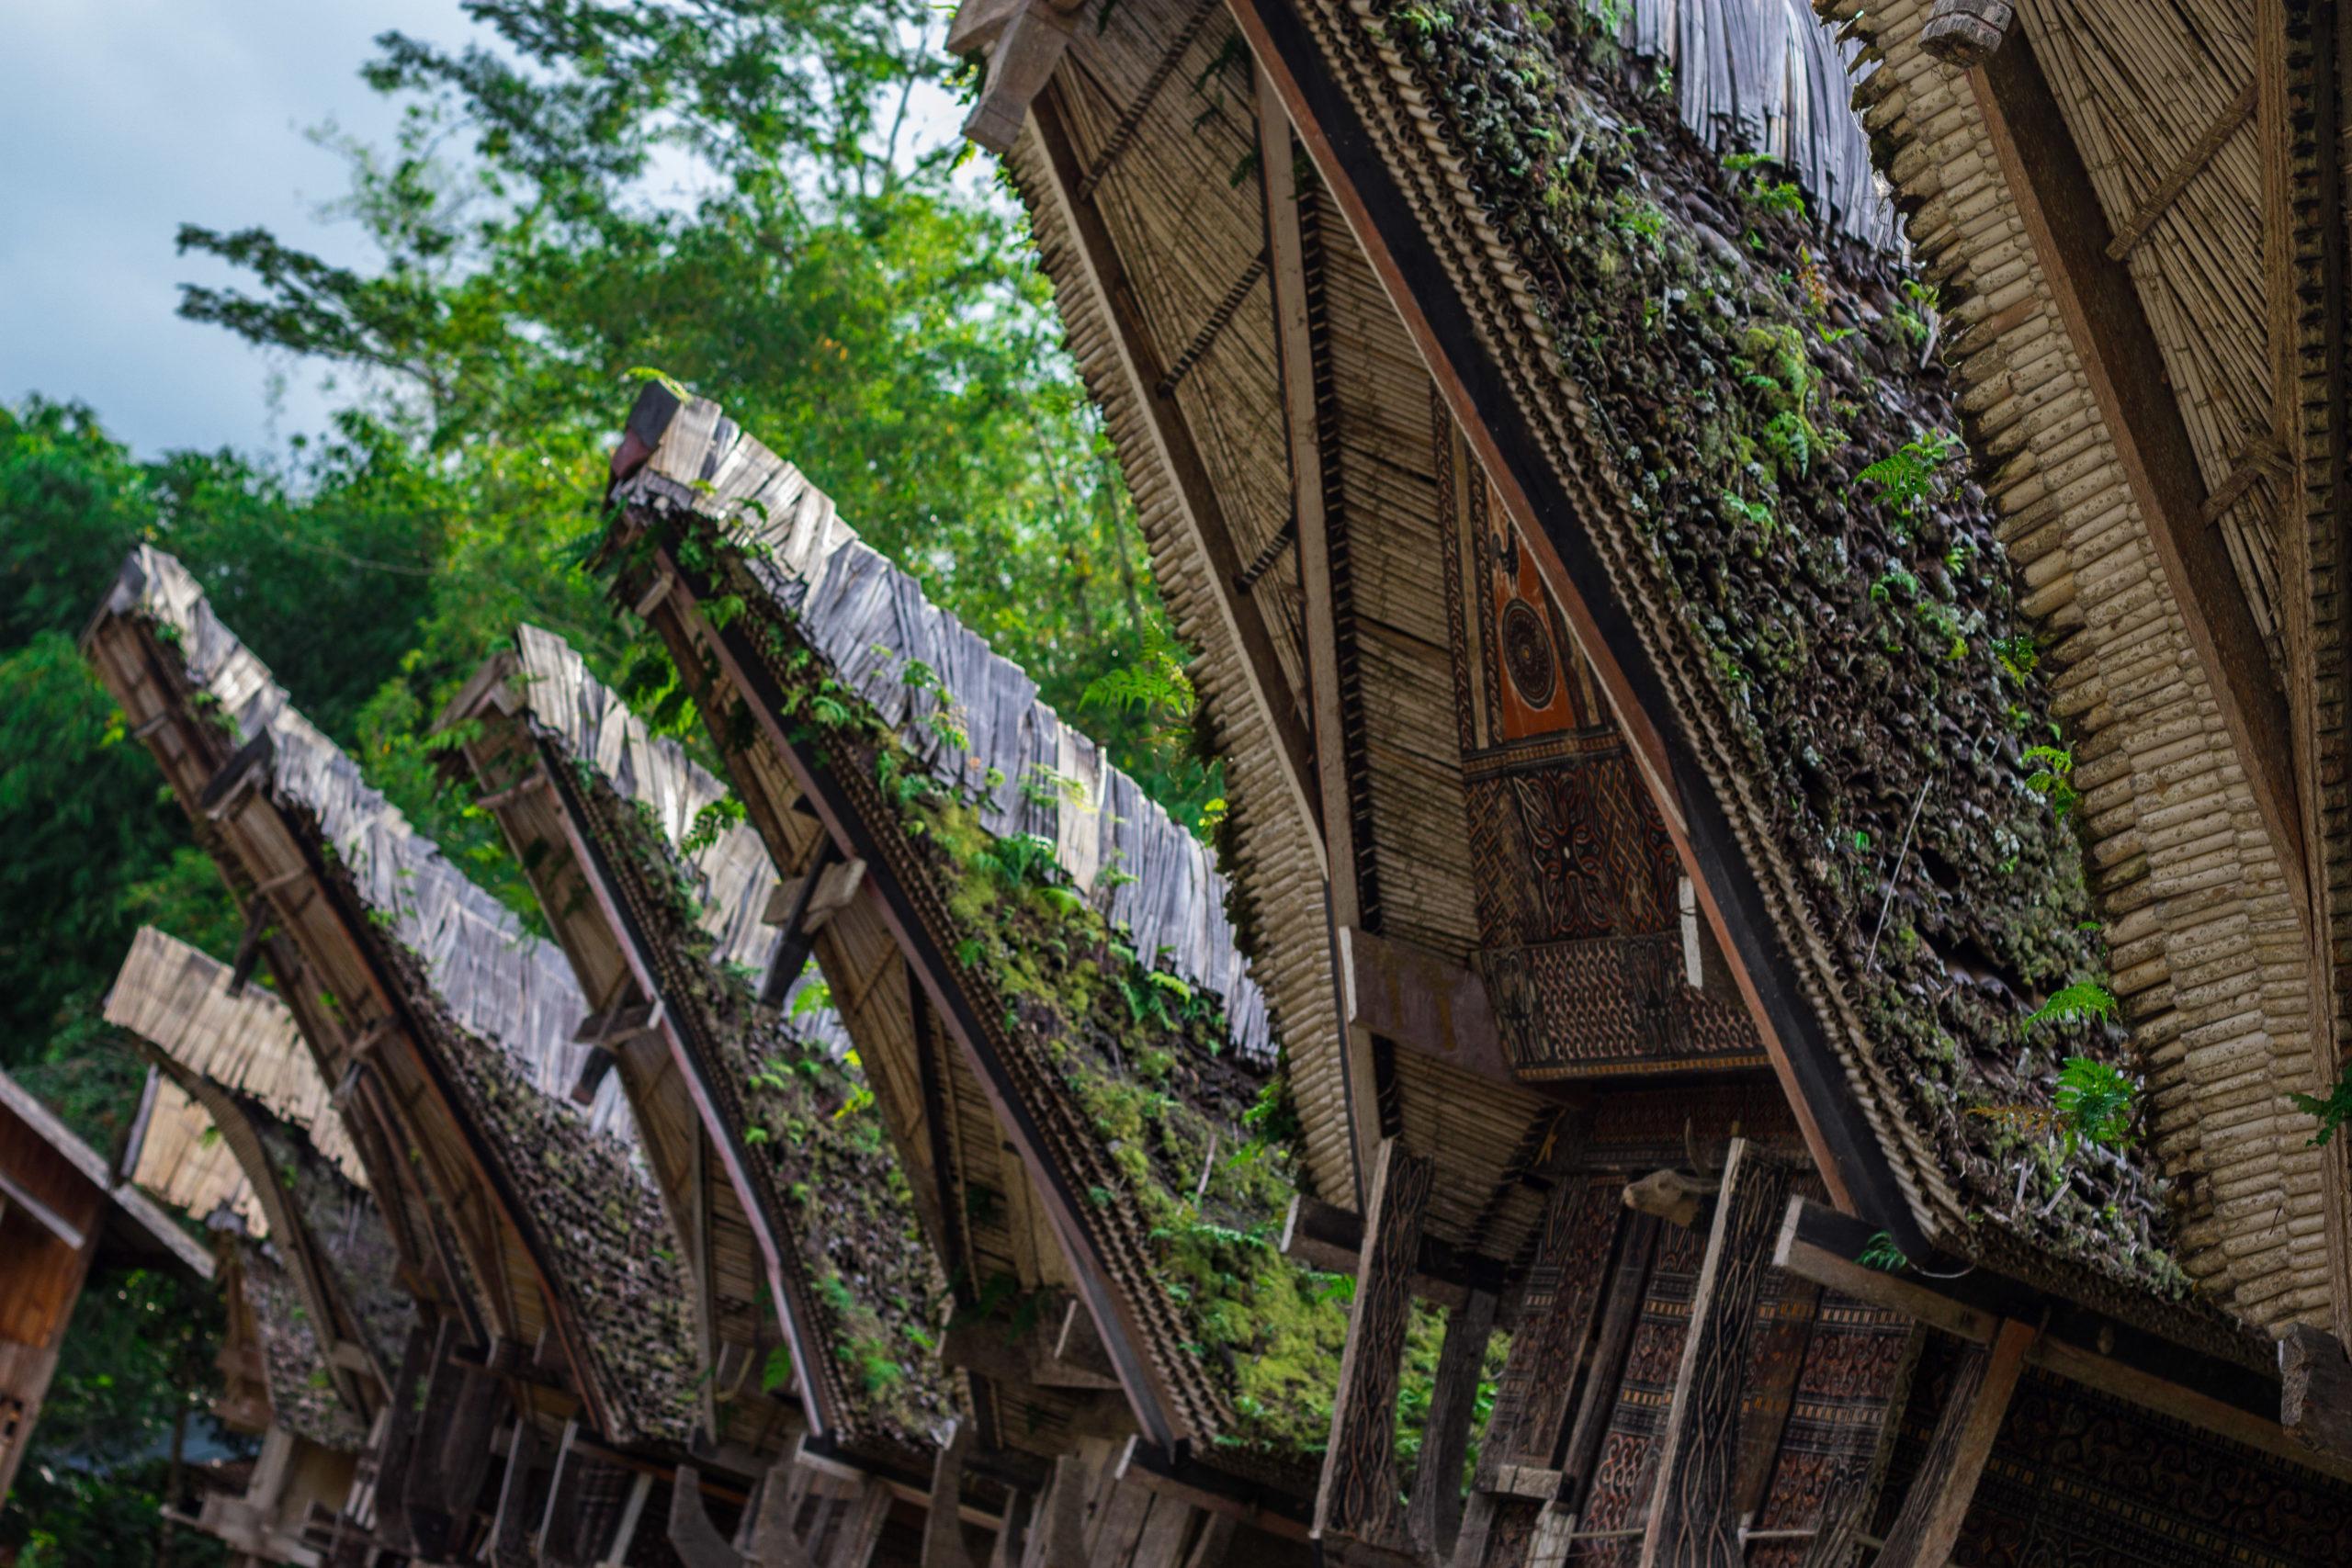 Maisons Toraja à Sulawesi, Indonésie